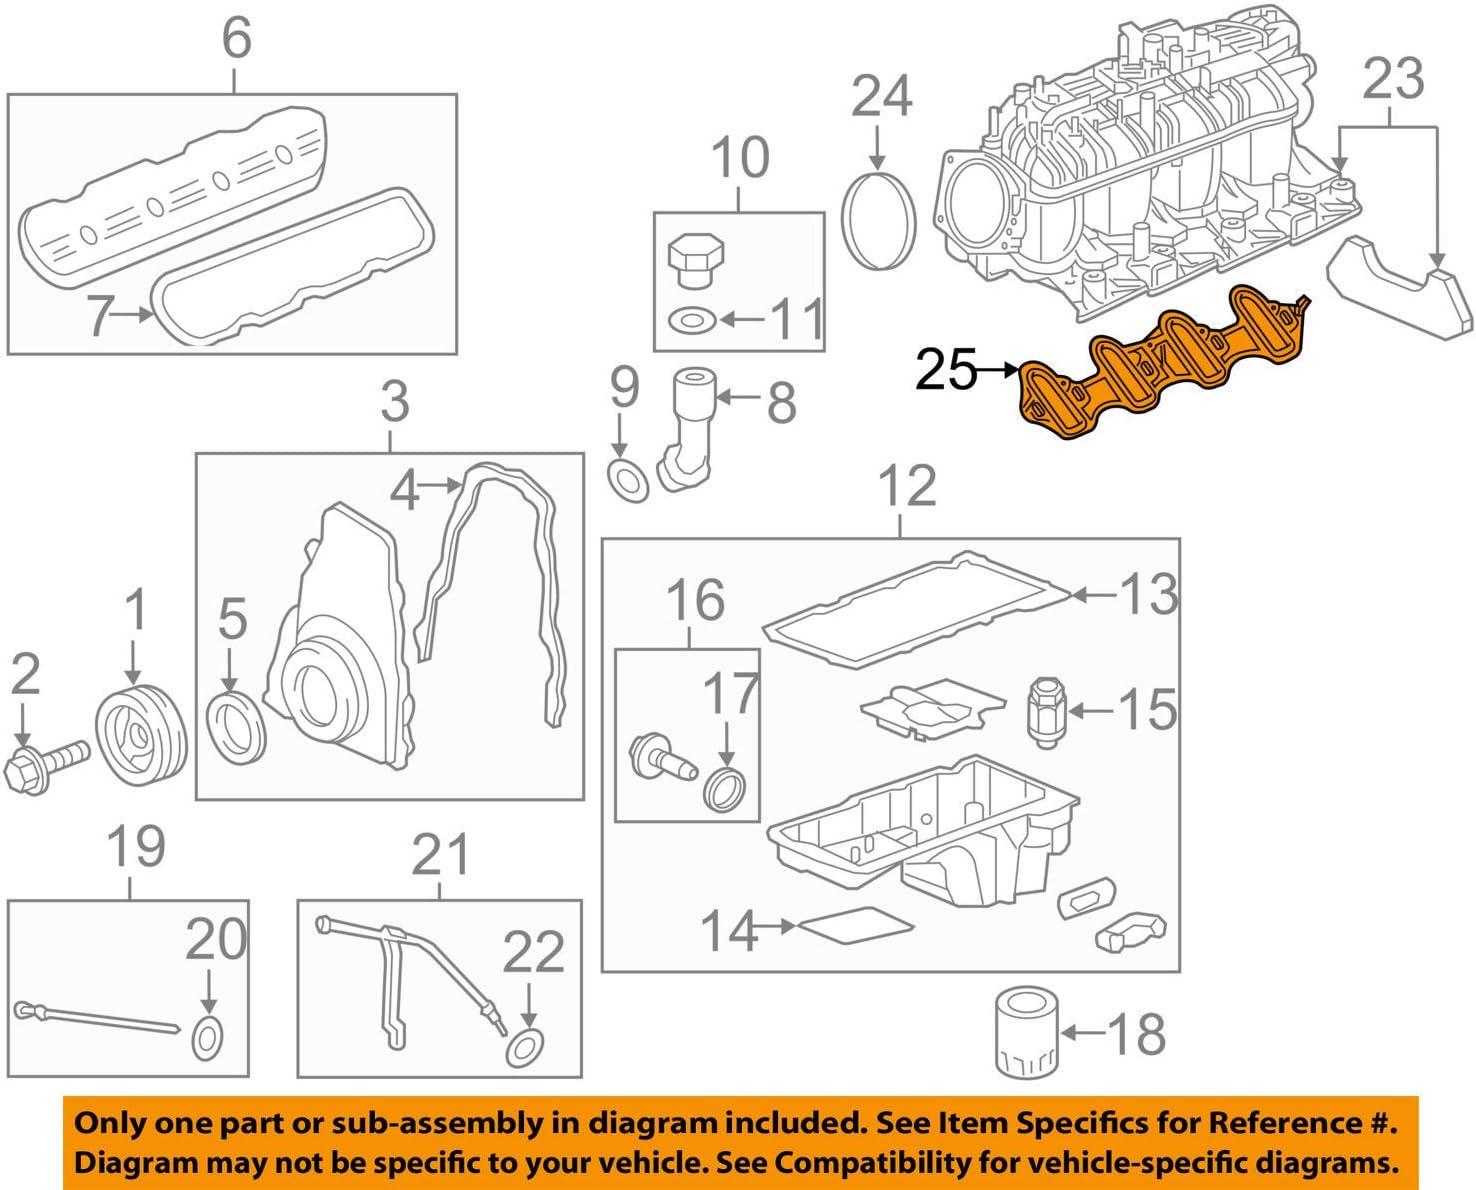 amazon.com: general motors 19207929, engine intake manifold gasket set:  automotive  amazon.com